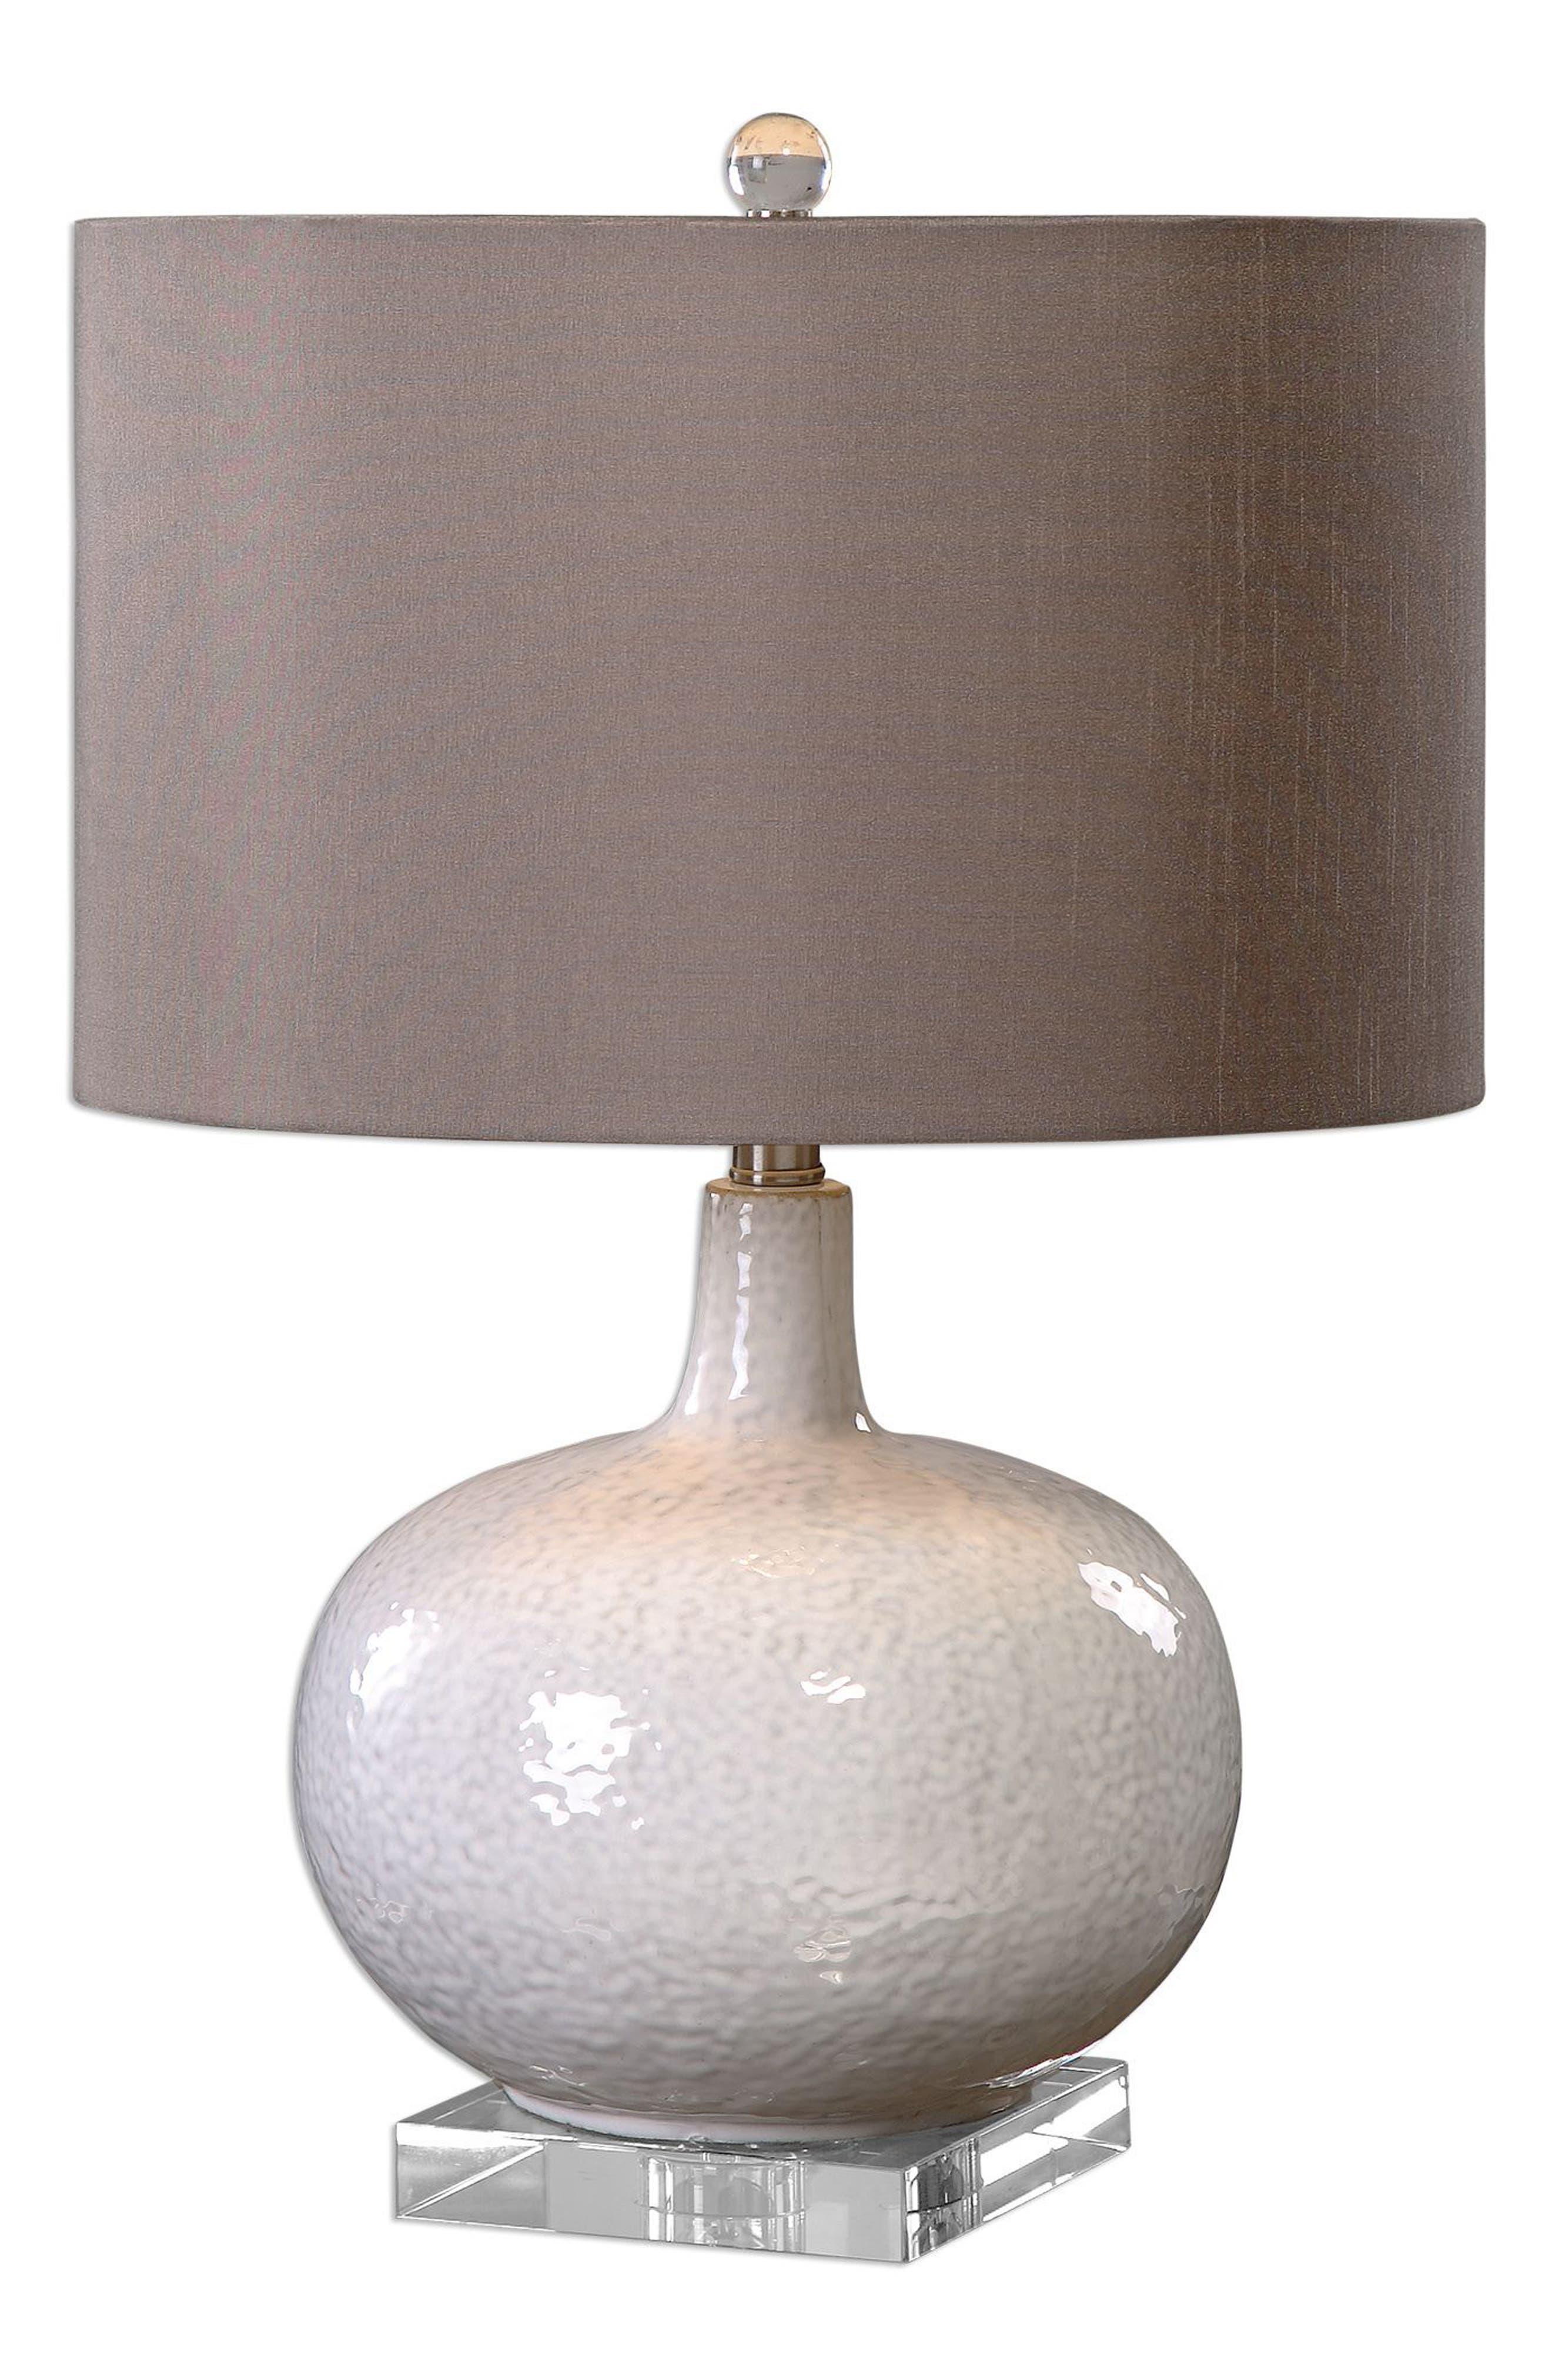 Main Image - Uttermost Parvati Table Lamp